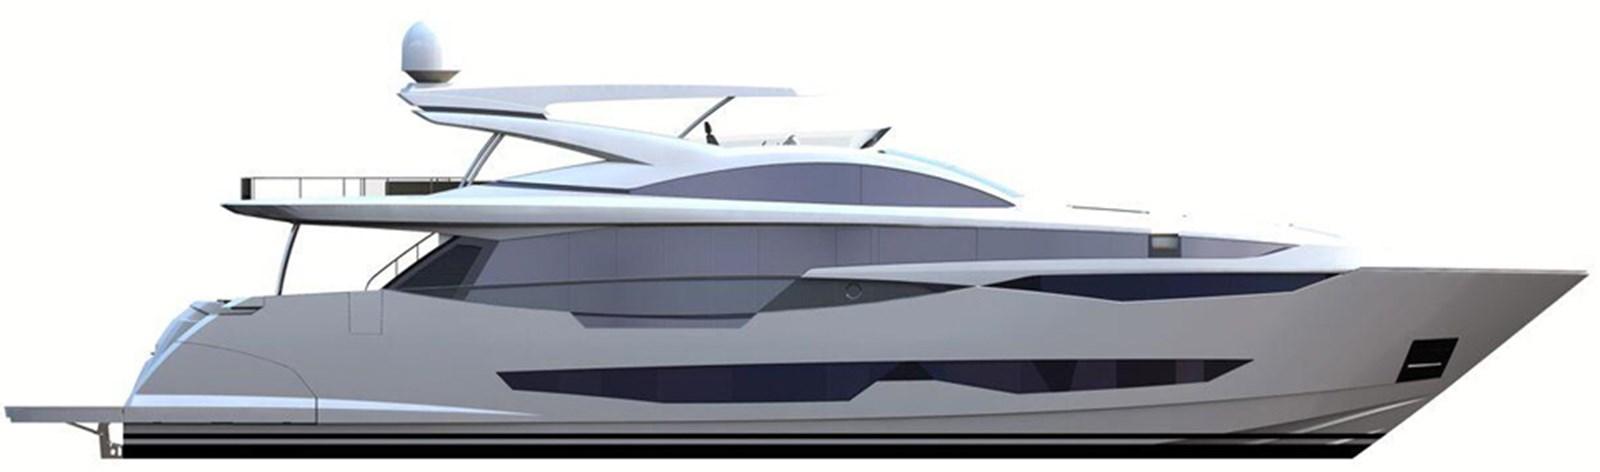 pearl-95-layout-5 2020 PEARL MOTOR YACHTS Pearl 95 Motor Yacht 2737974